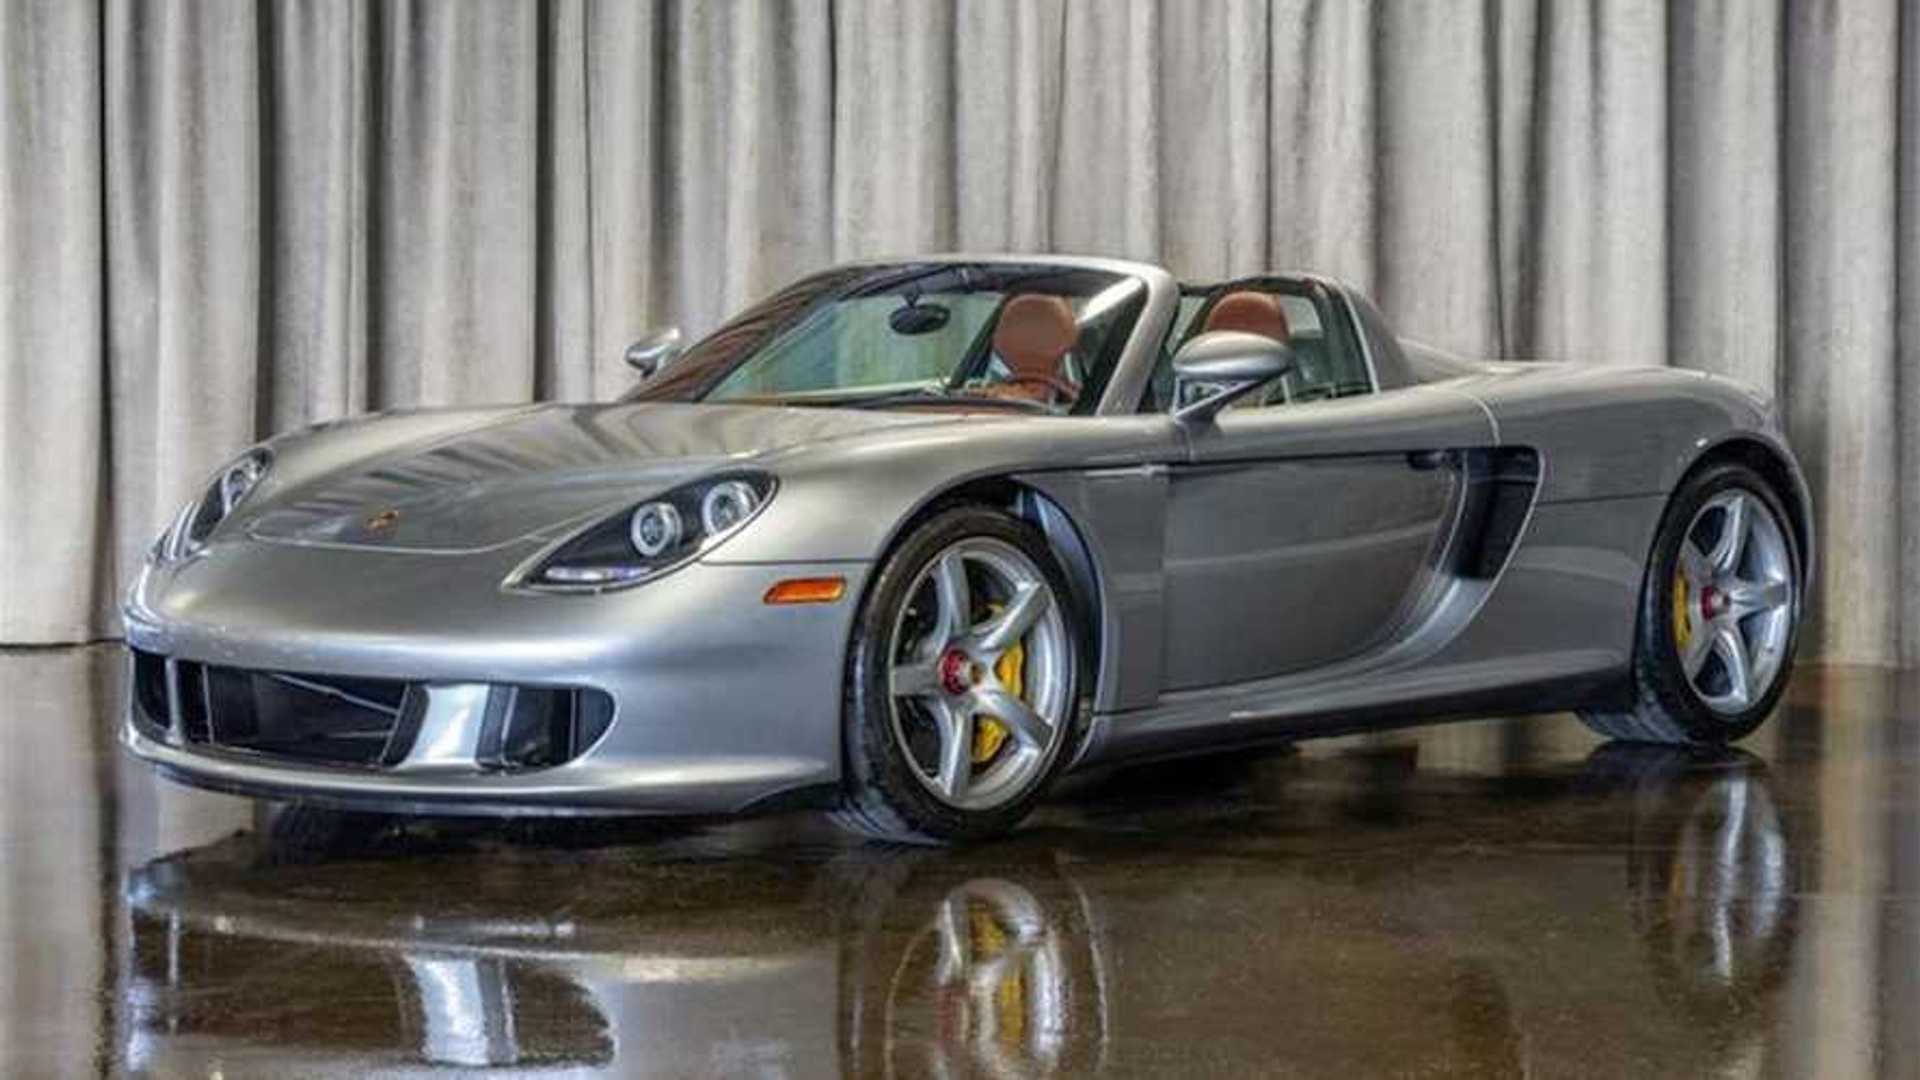 69,Mile Porsche Carrera GT For Sale Looks Factory,Fresh